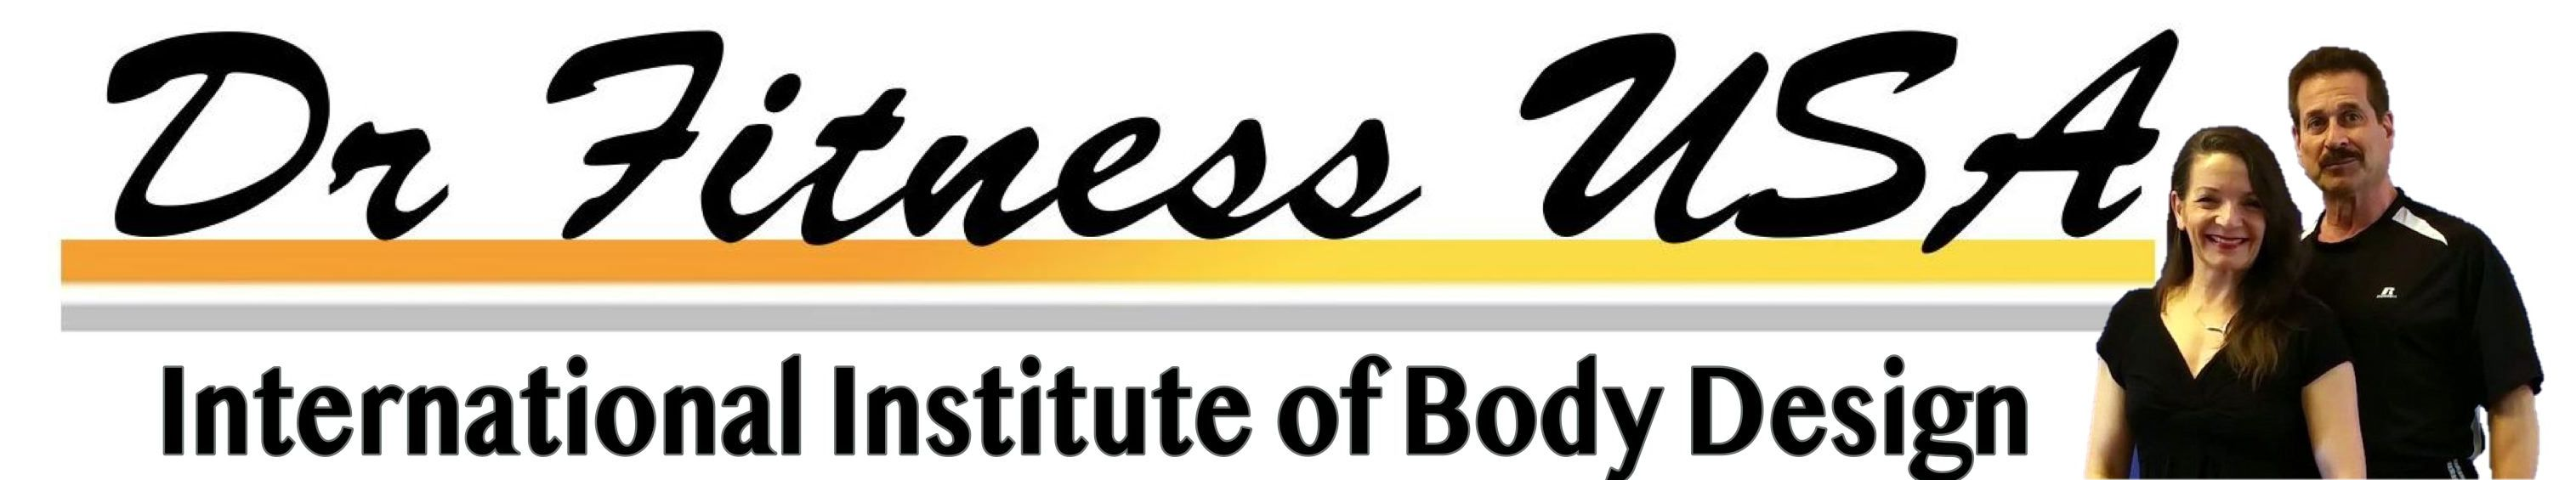 International Institute of Body Design